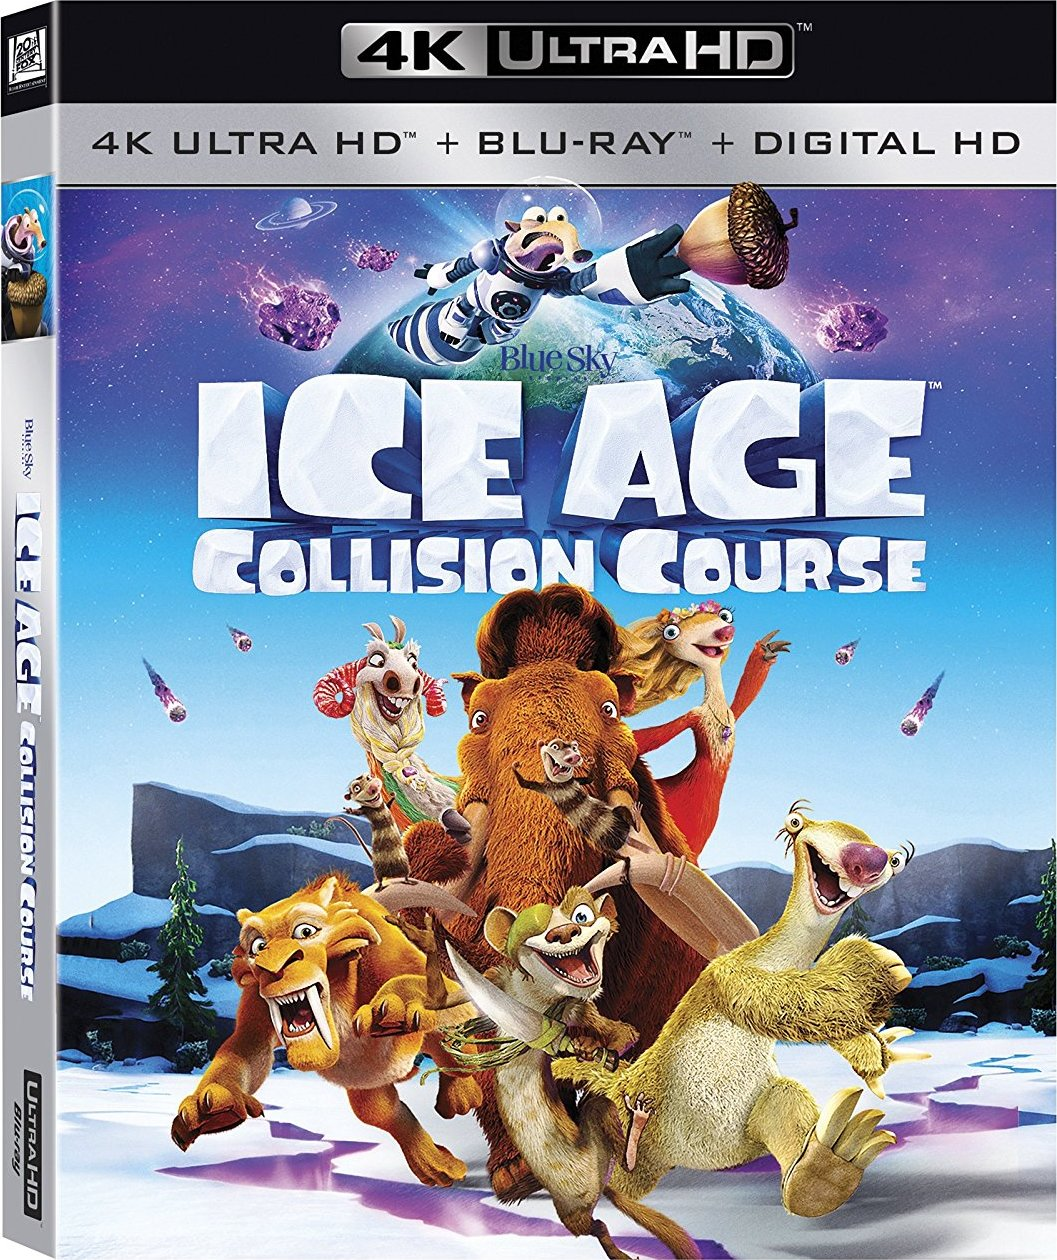 Ice Age: Collision Course (2016) 4K Ultra HD Blu-ray